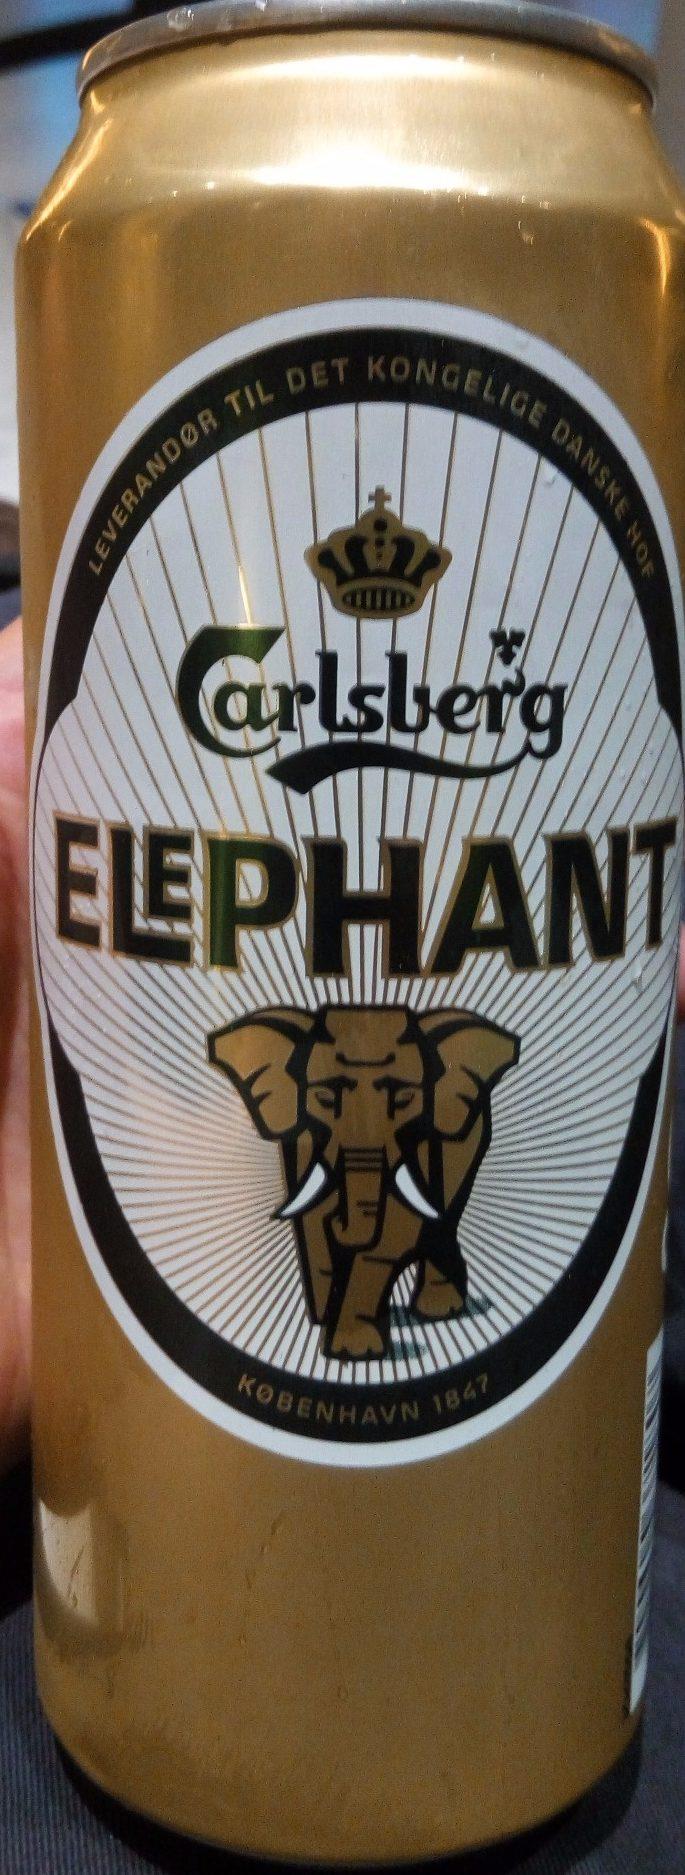 Elephant - Produkt - da